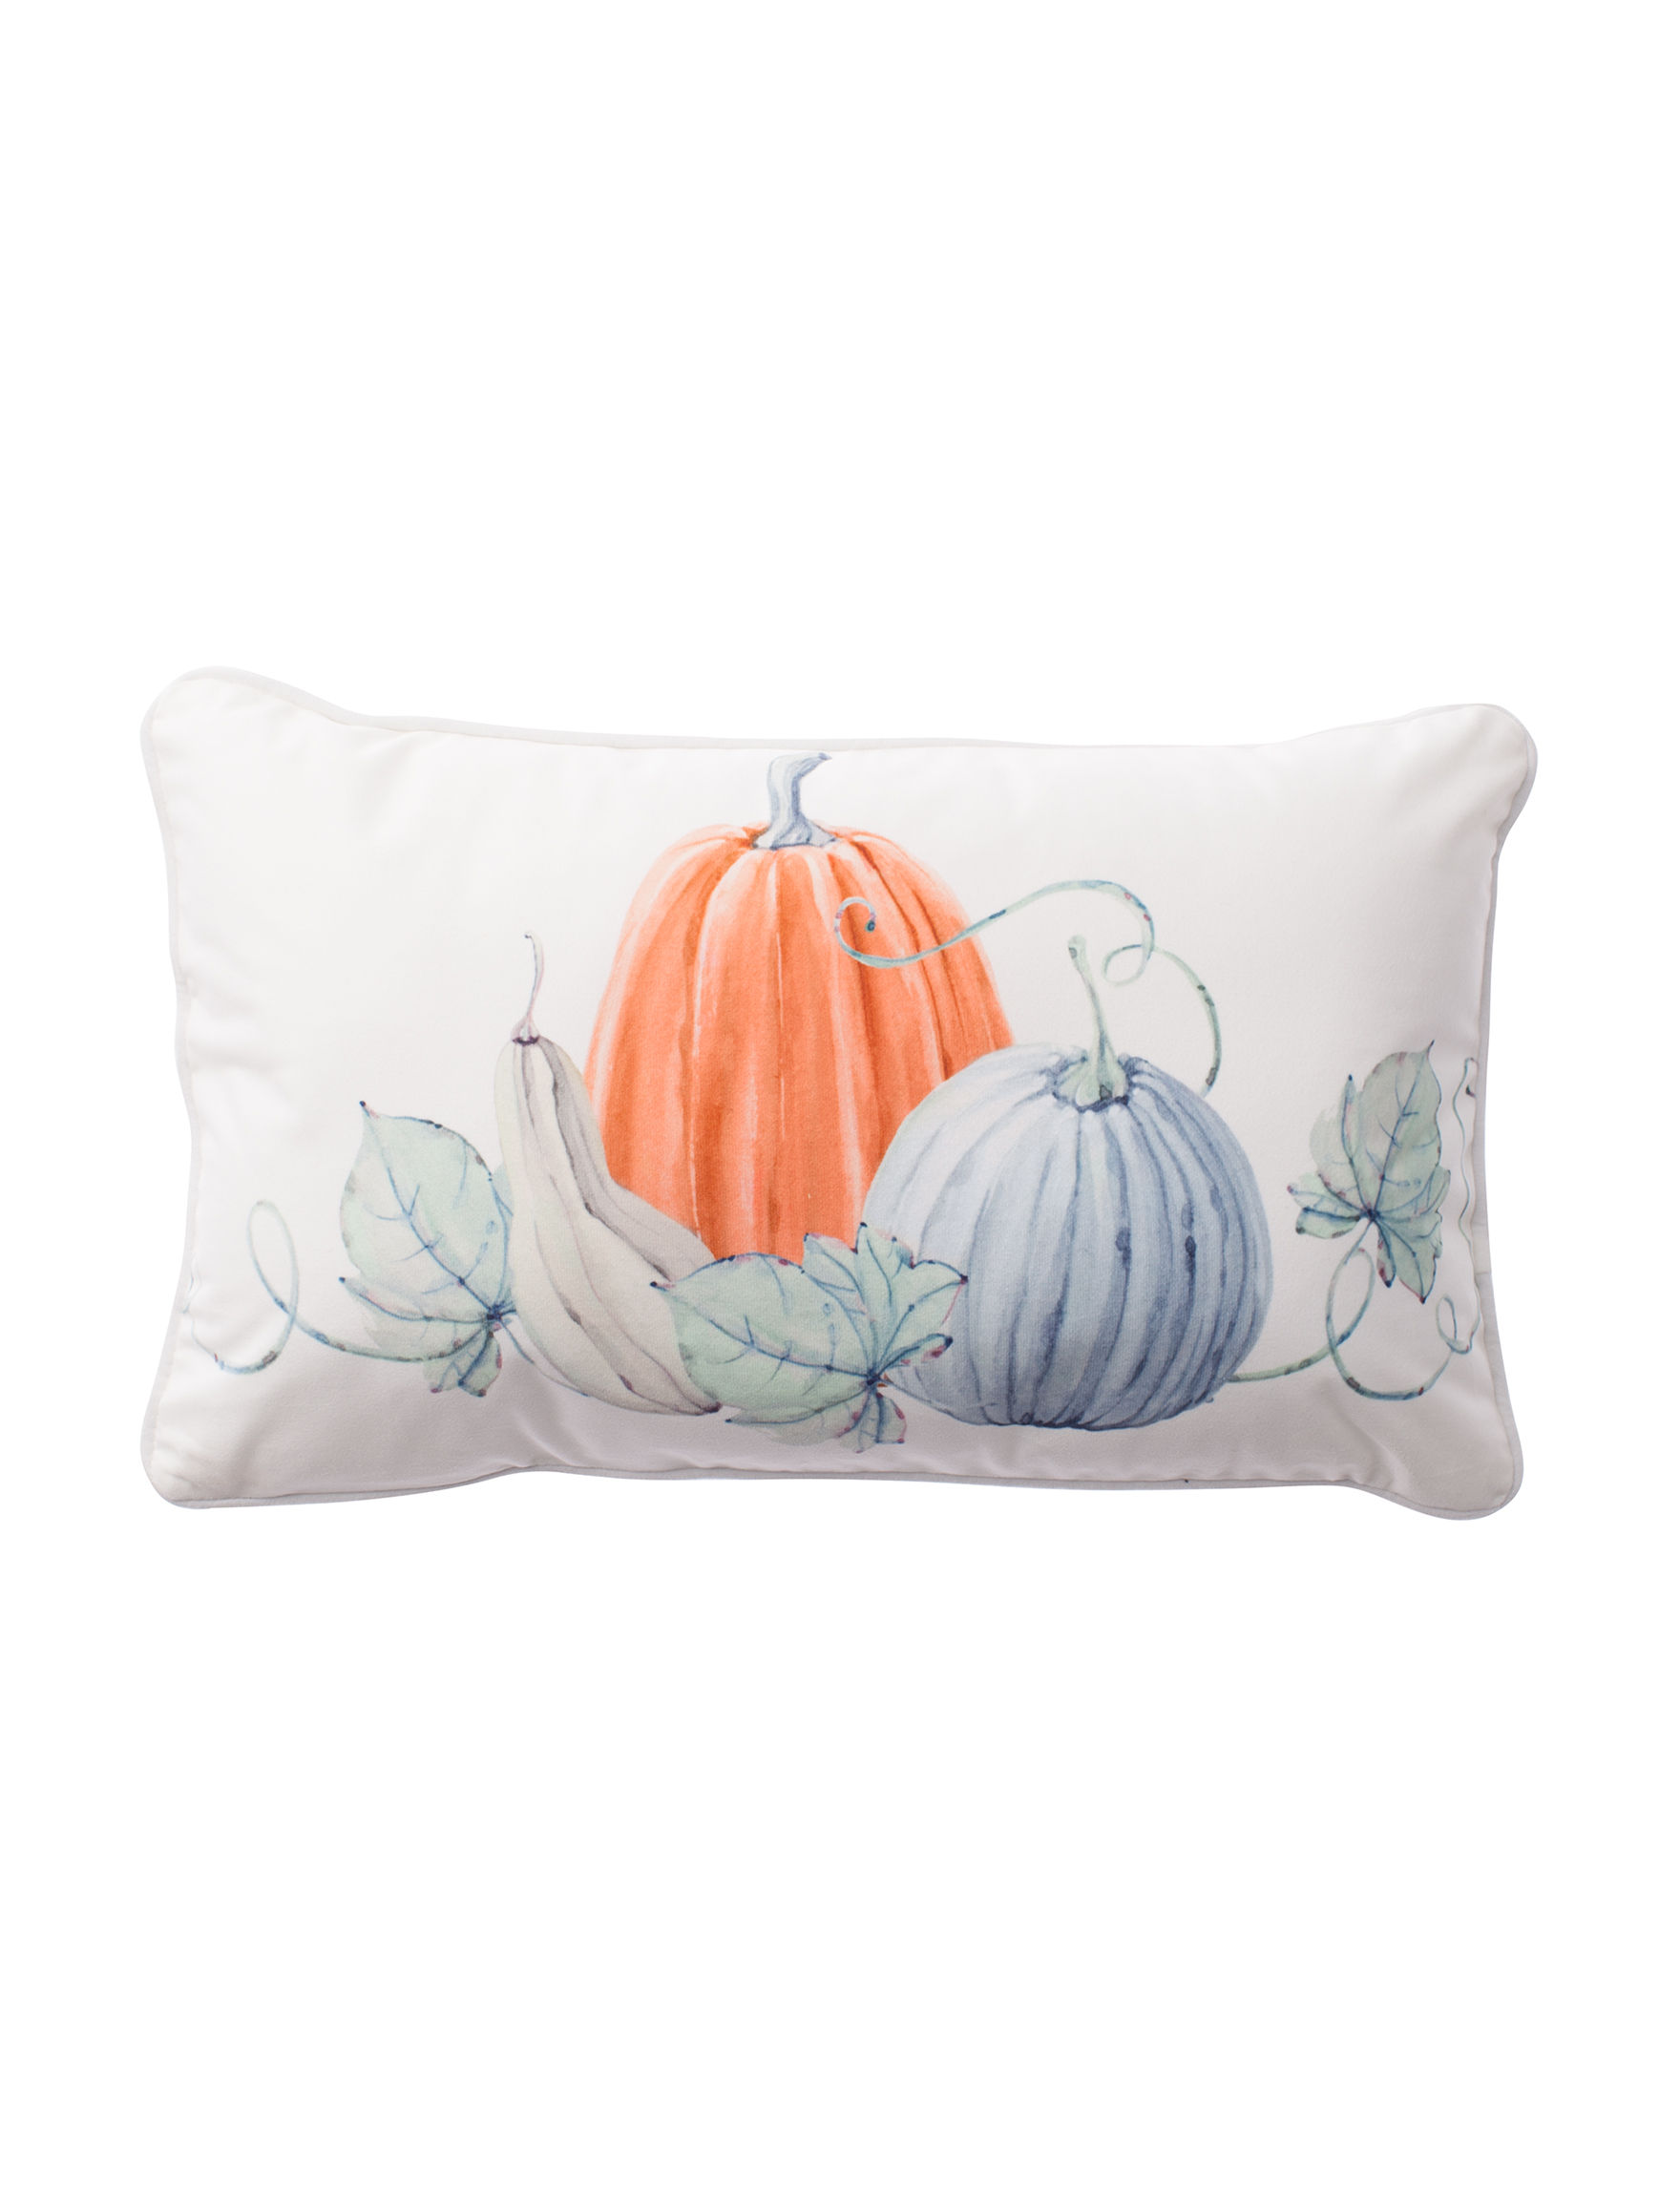 Thro Blue Multi Decorative Pillows